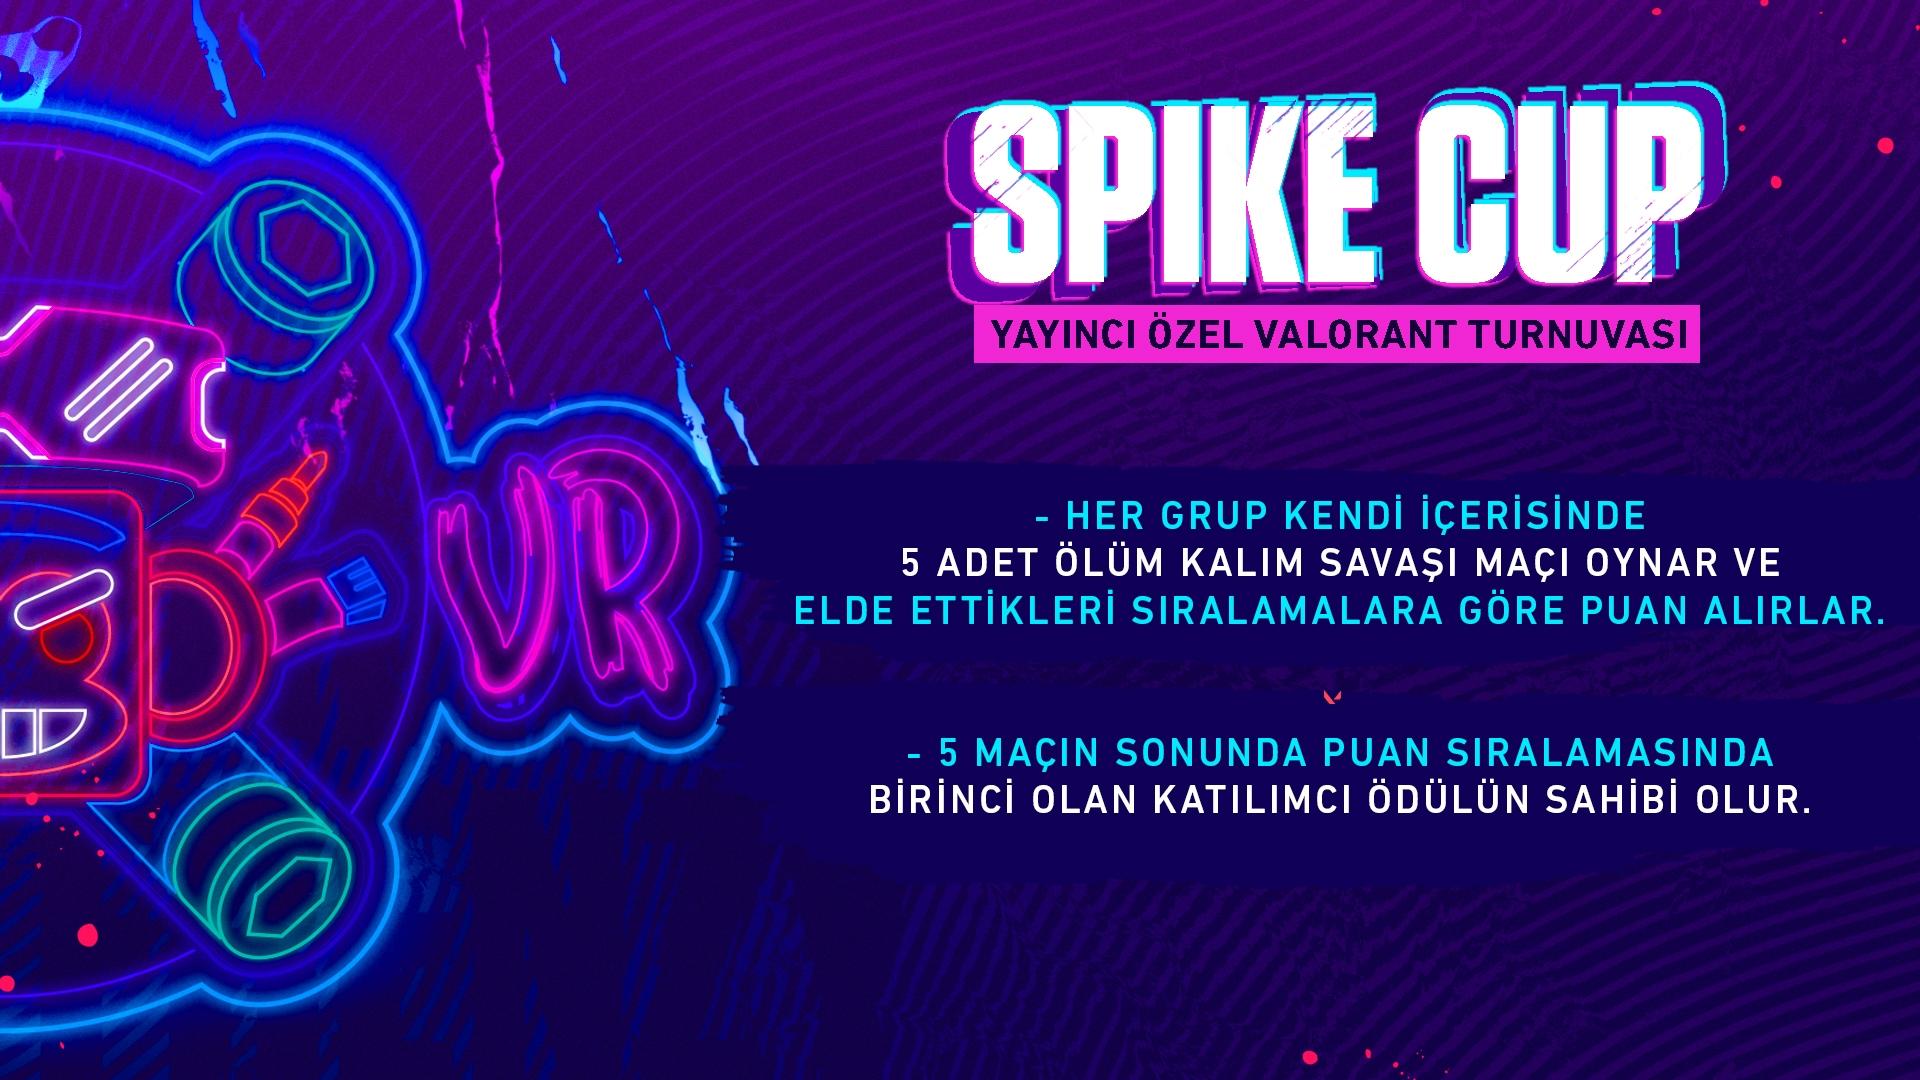 SPIKE_CUP_TURNUVA_İÇERİĞİ.jpg